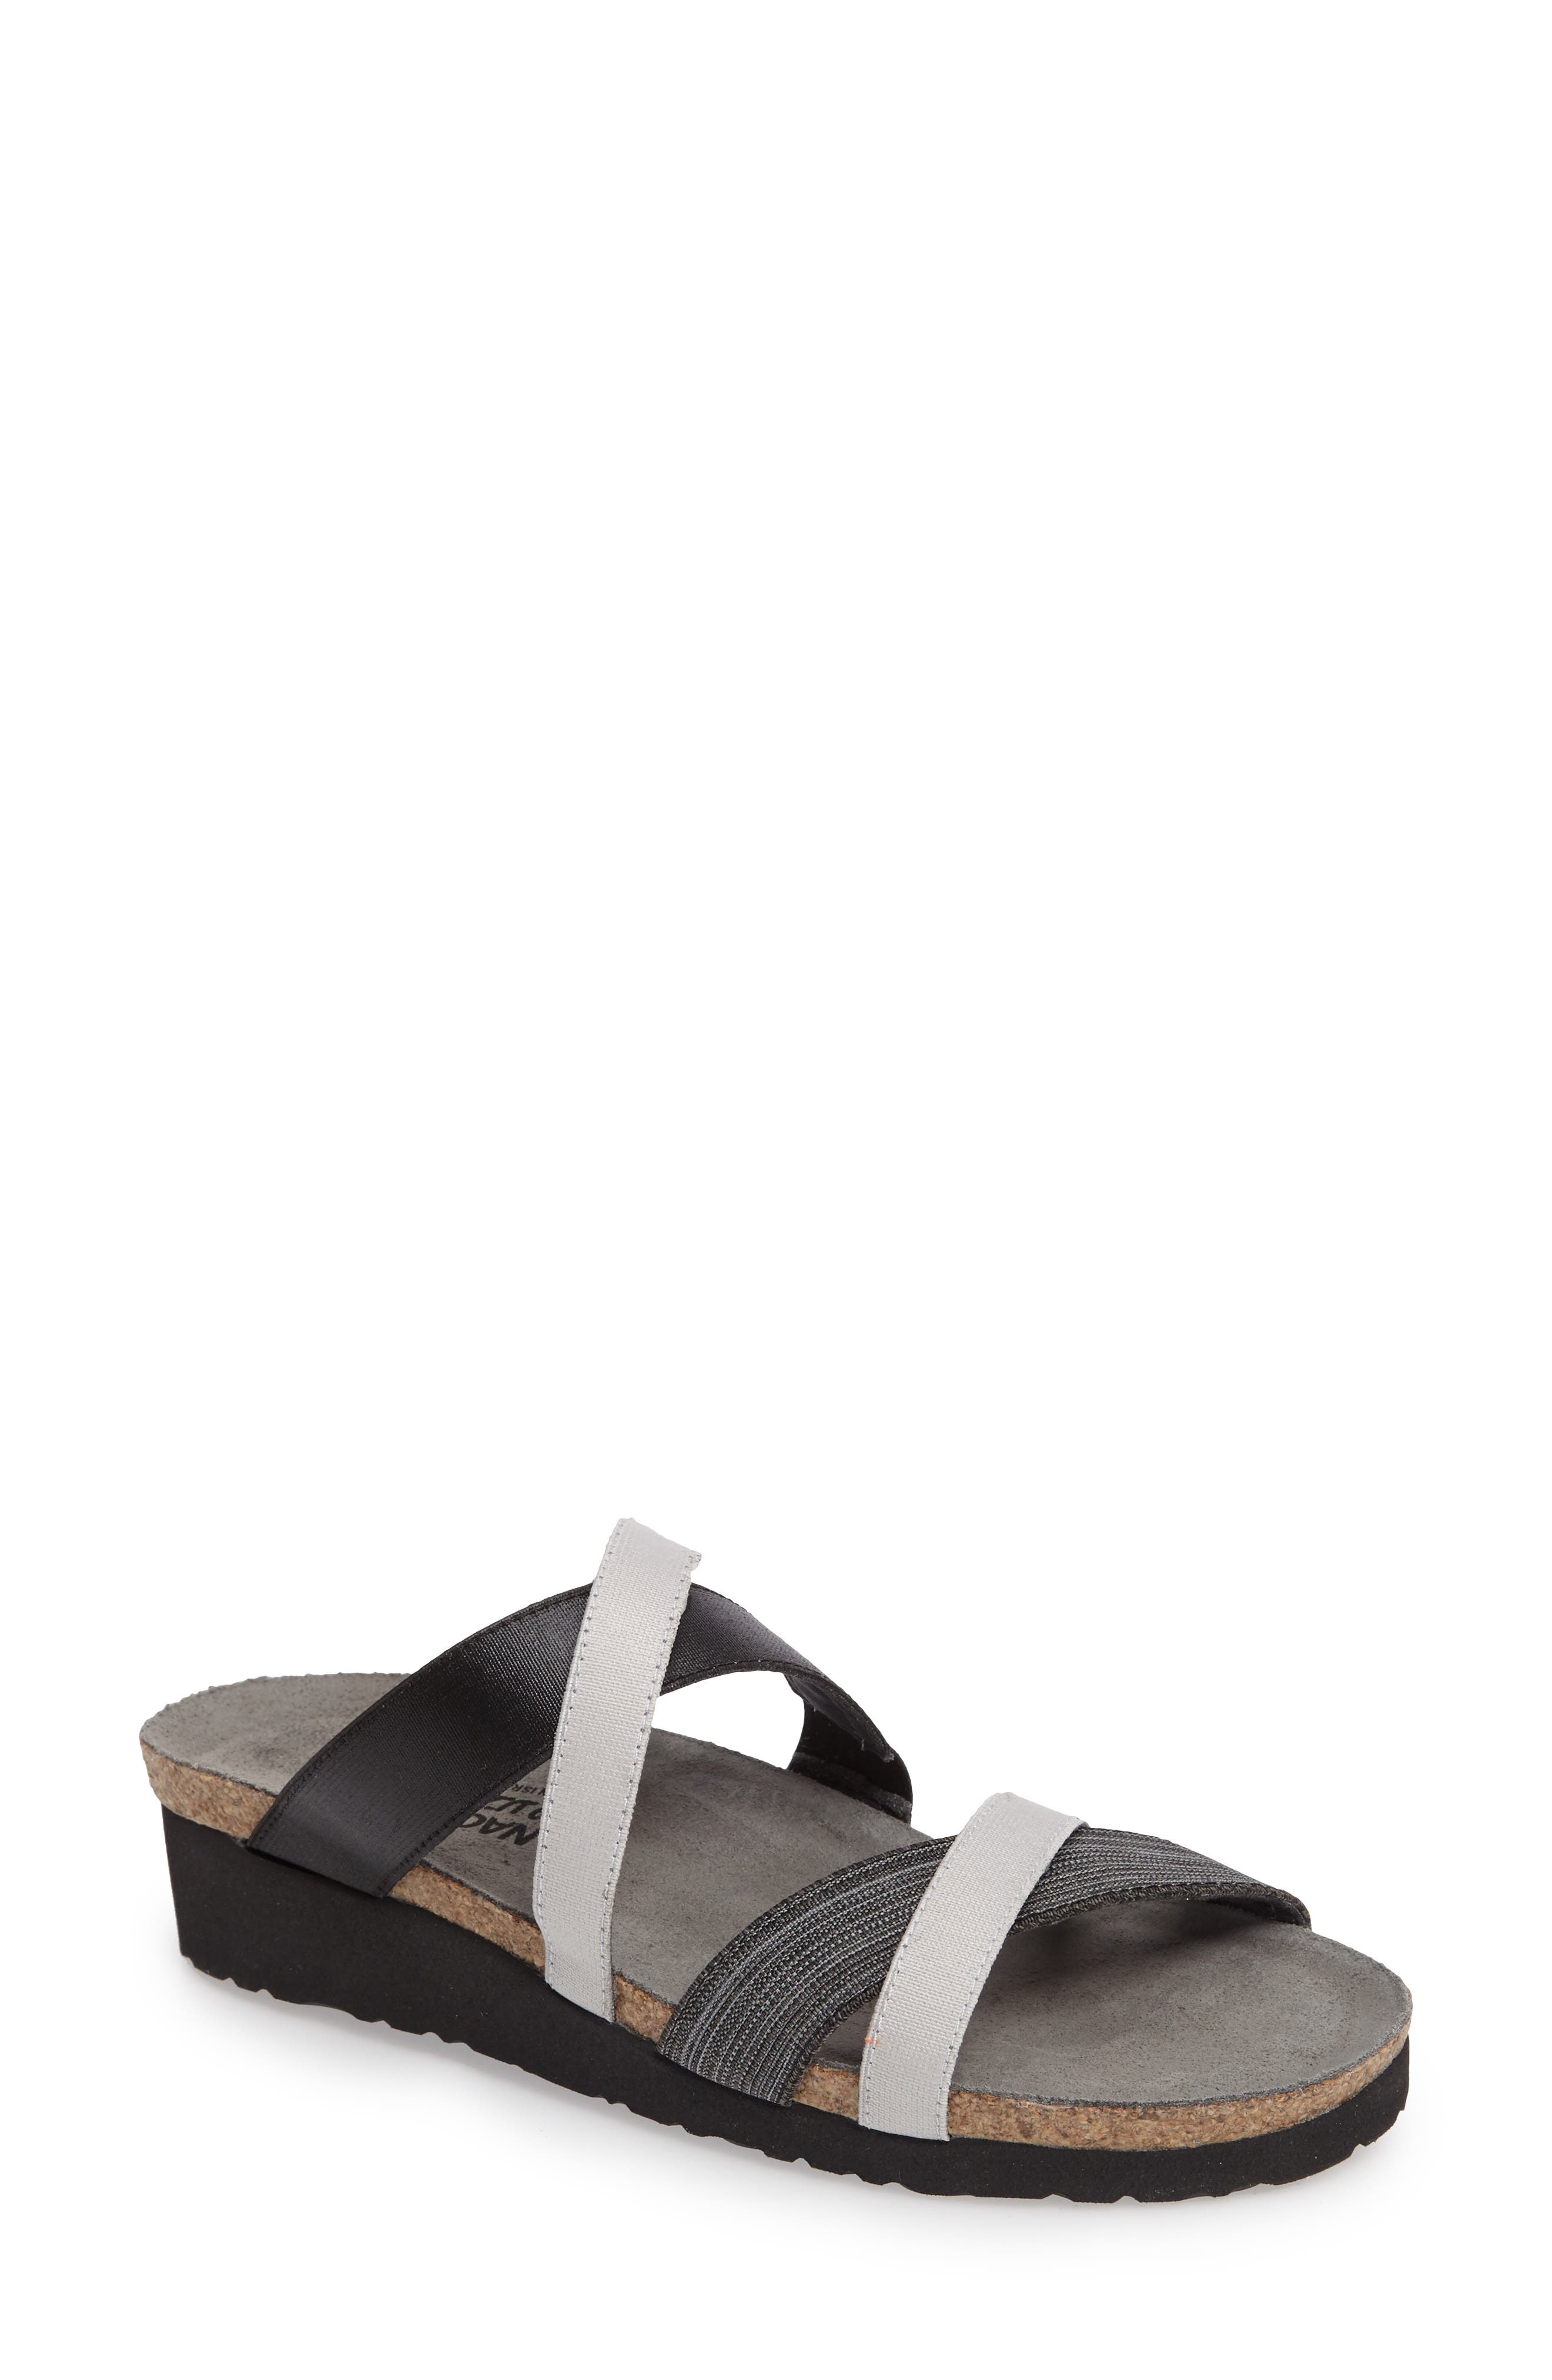 Roxana Strappy Slip-On Sandal,                         Main,                         color, BLACK/ GREY FABRIC